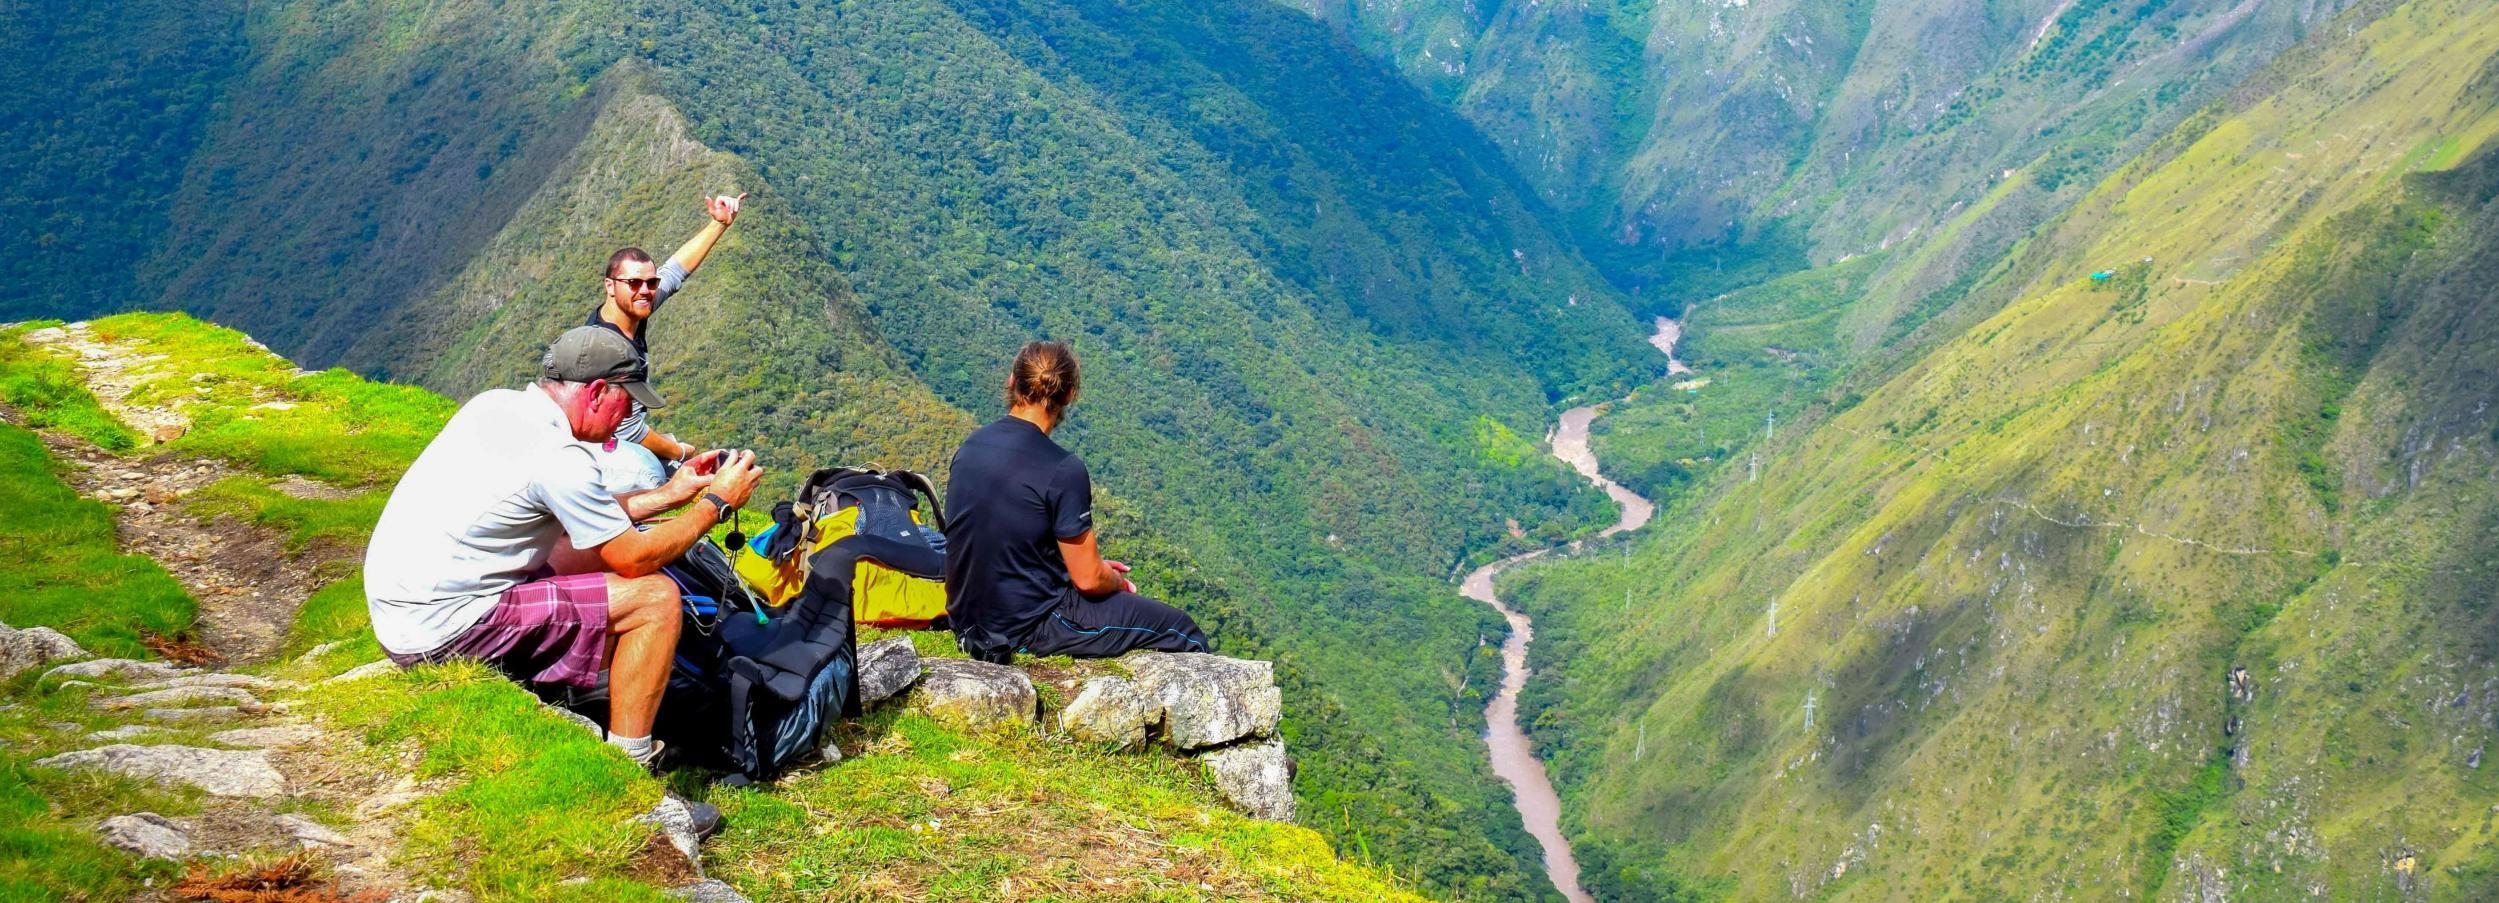 Cusco: 4-Day Inca Trail to Machu Picchu Small Group Trek